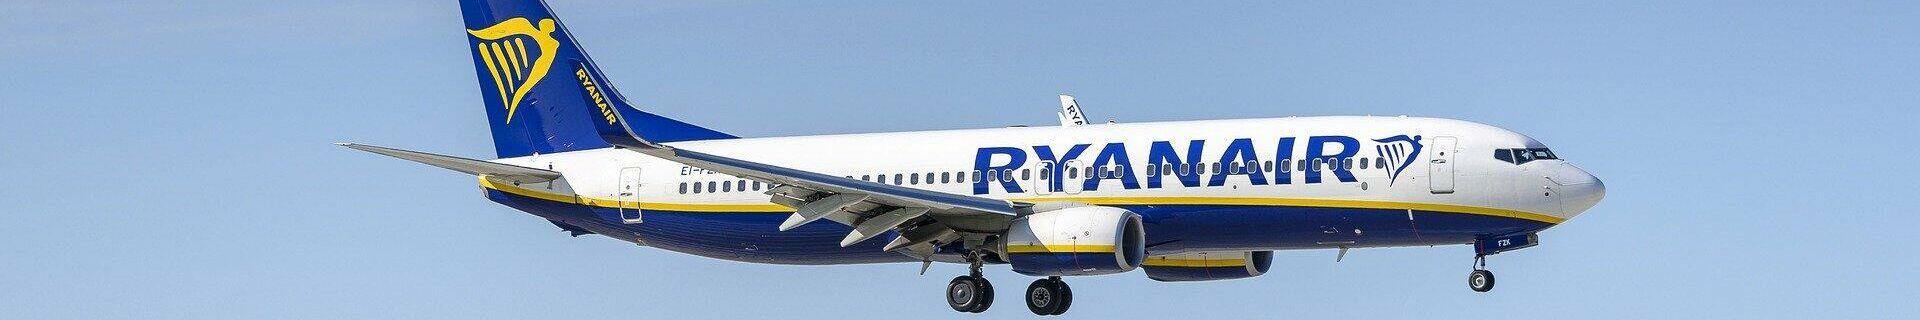 Самолет Ryanair - Sputnik Беларусь, 1920, 30.06.2021